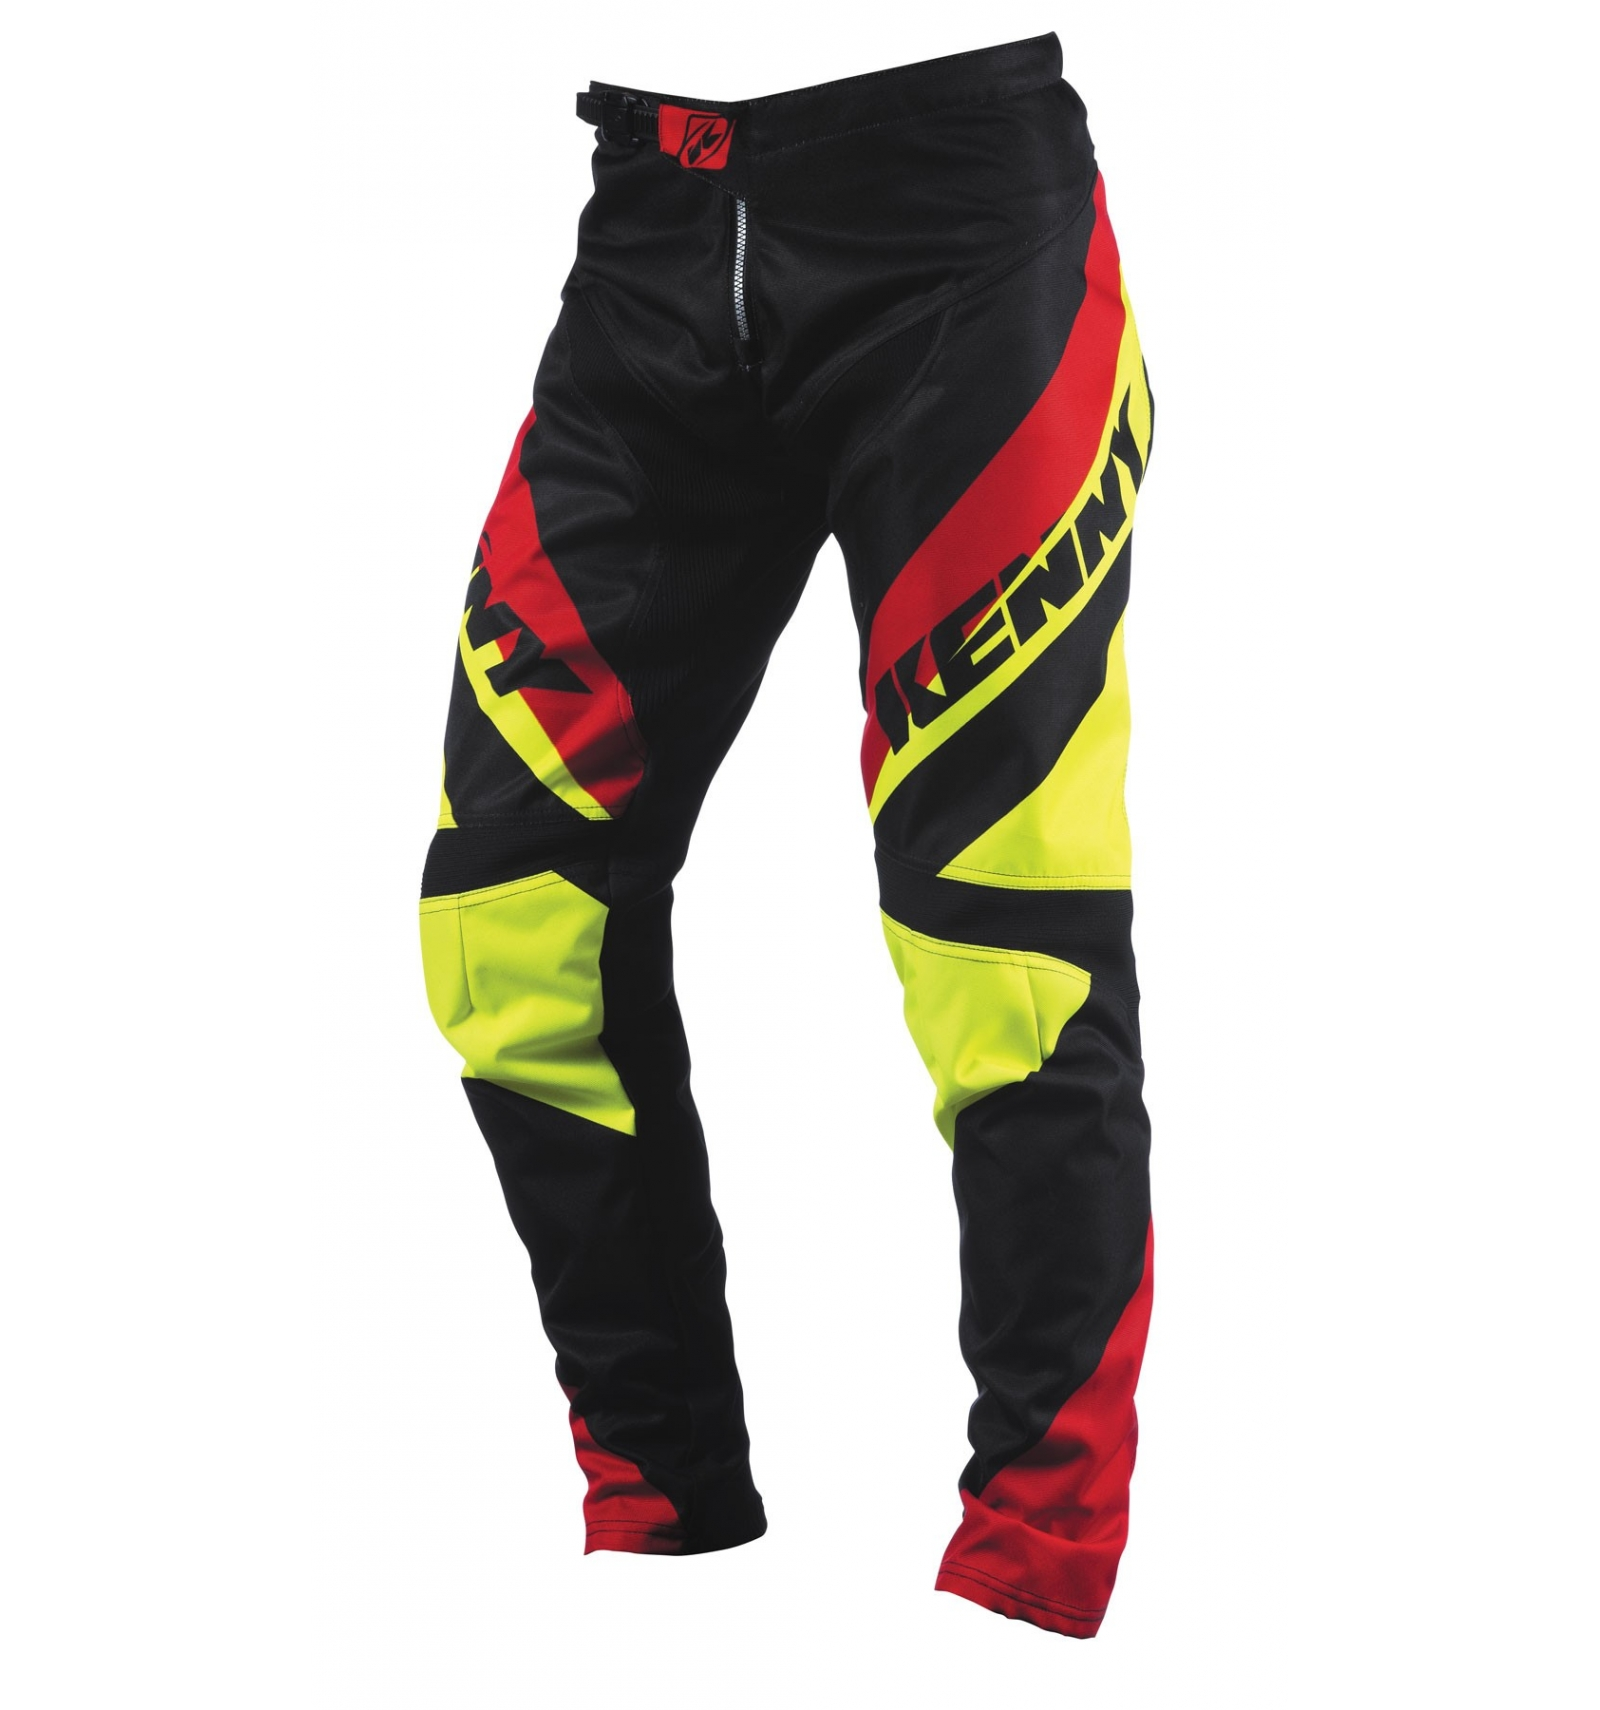 pantalon kenny bmx 2015 jaune fluo rouge - Chambre Jaune Fluo